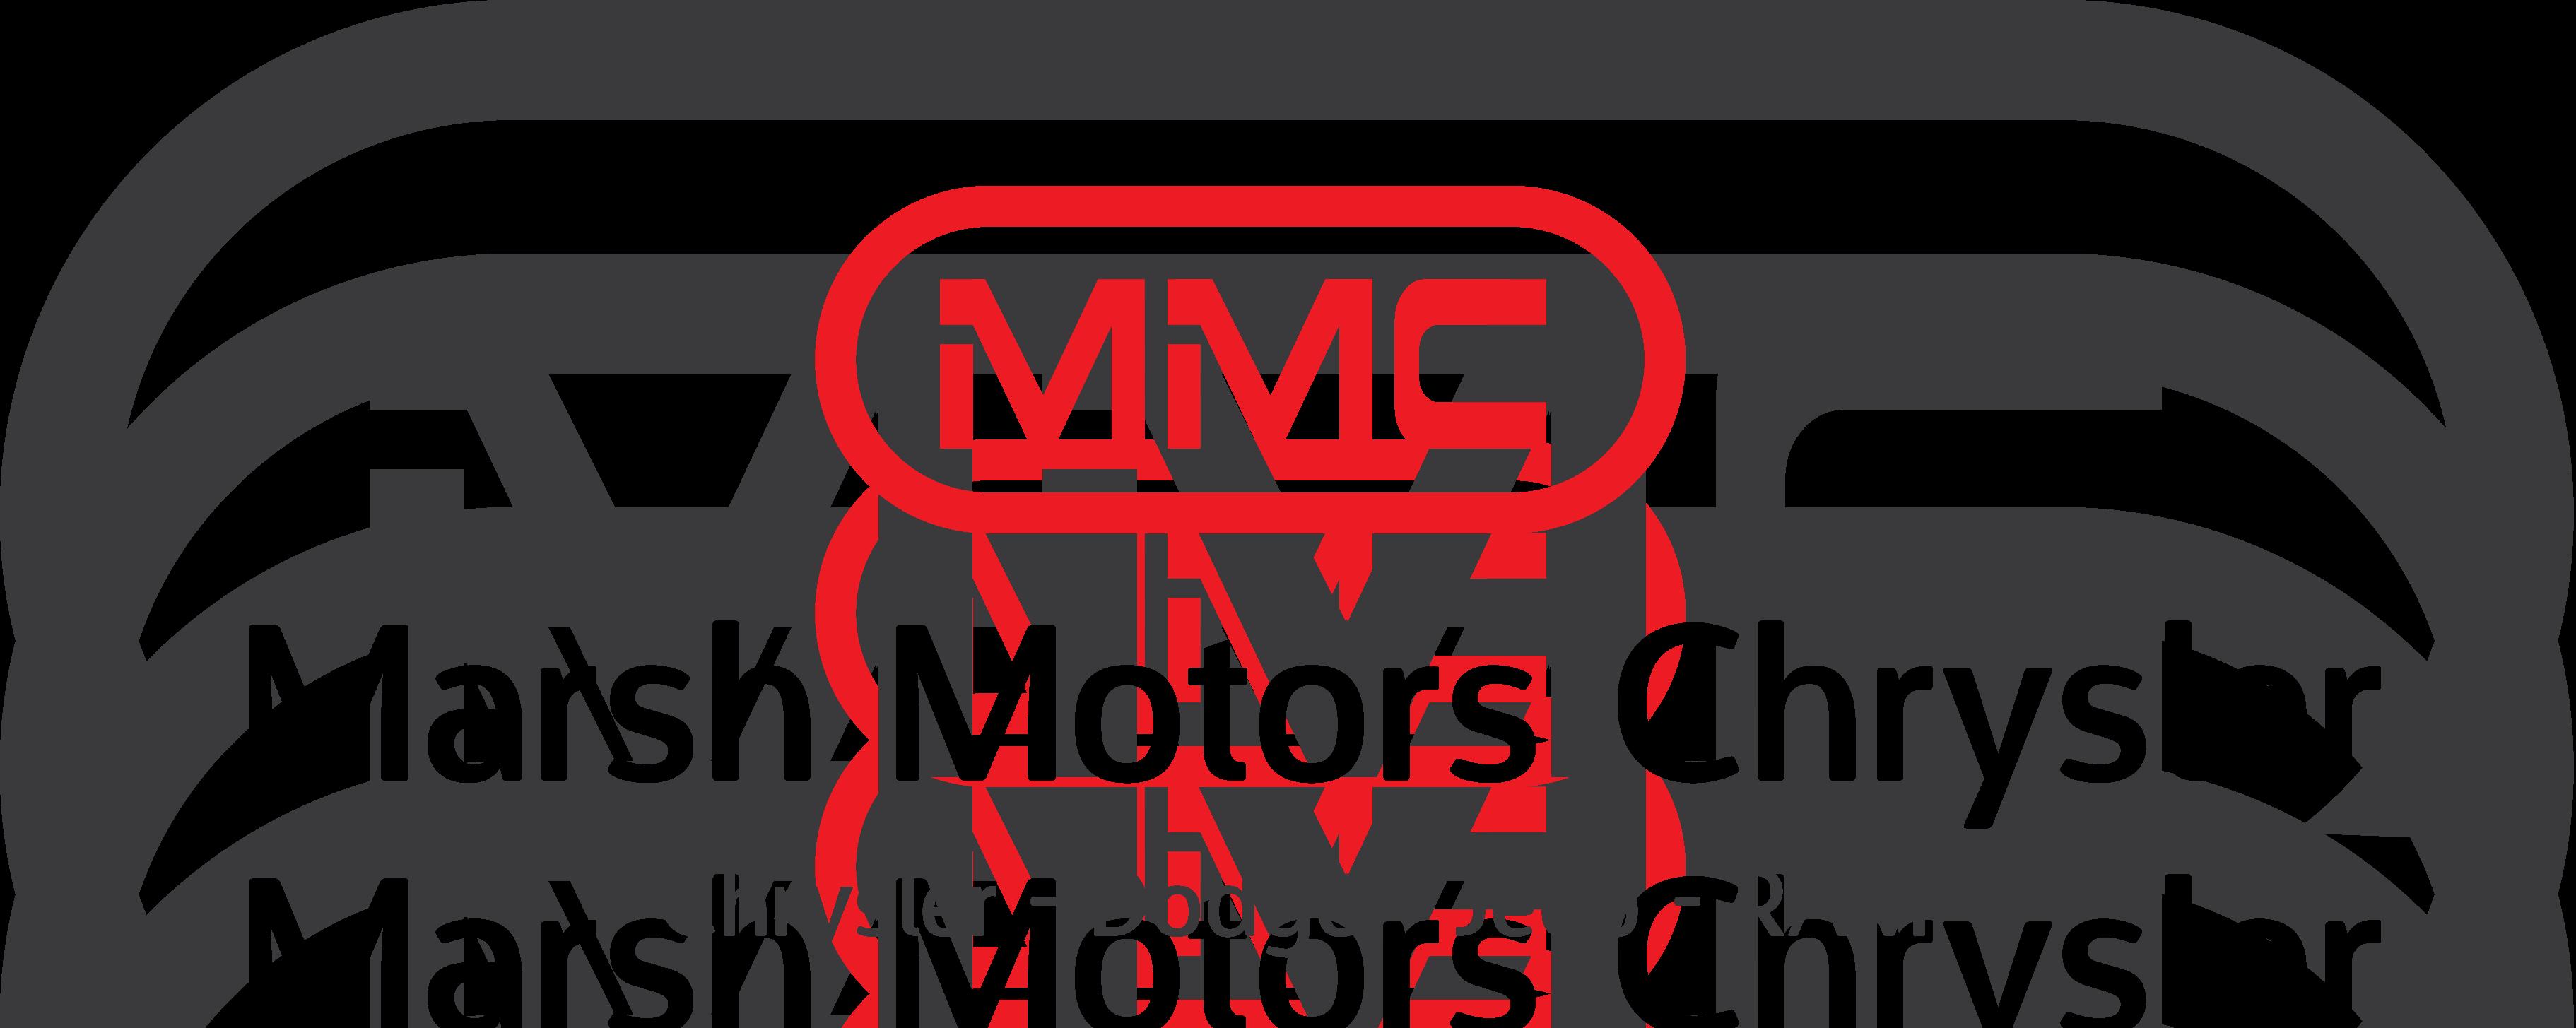 Logo Design by 354studio - Entry No. 43 in the Logo Design Contest Marsh Motors Chrysler Logo Design.